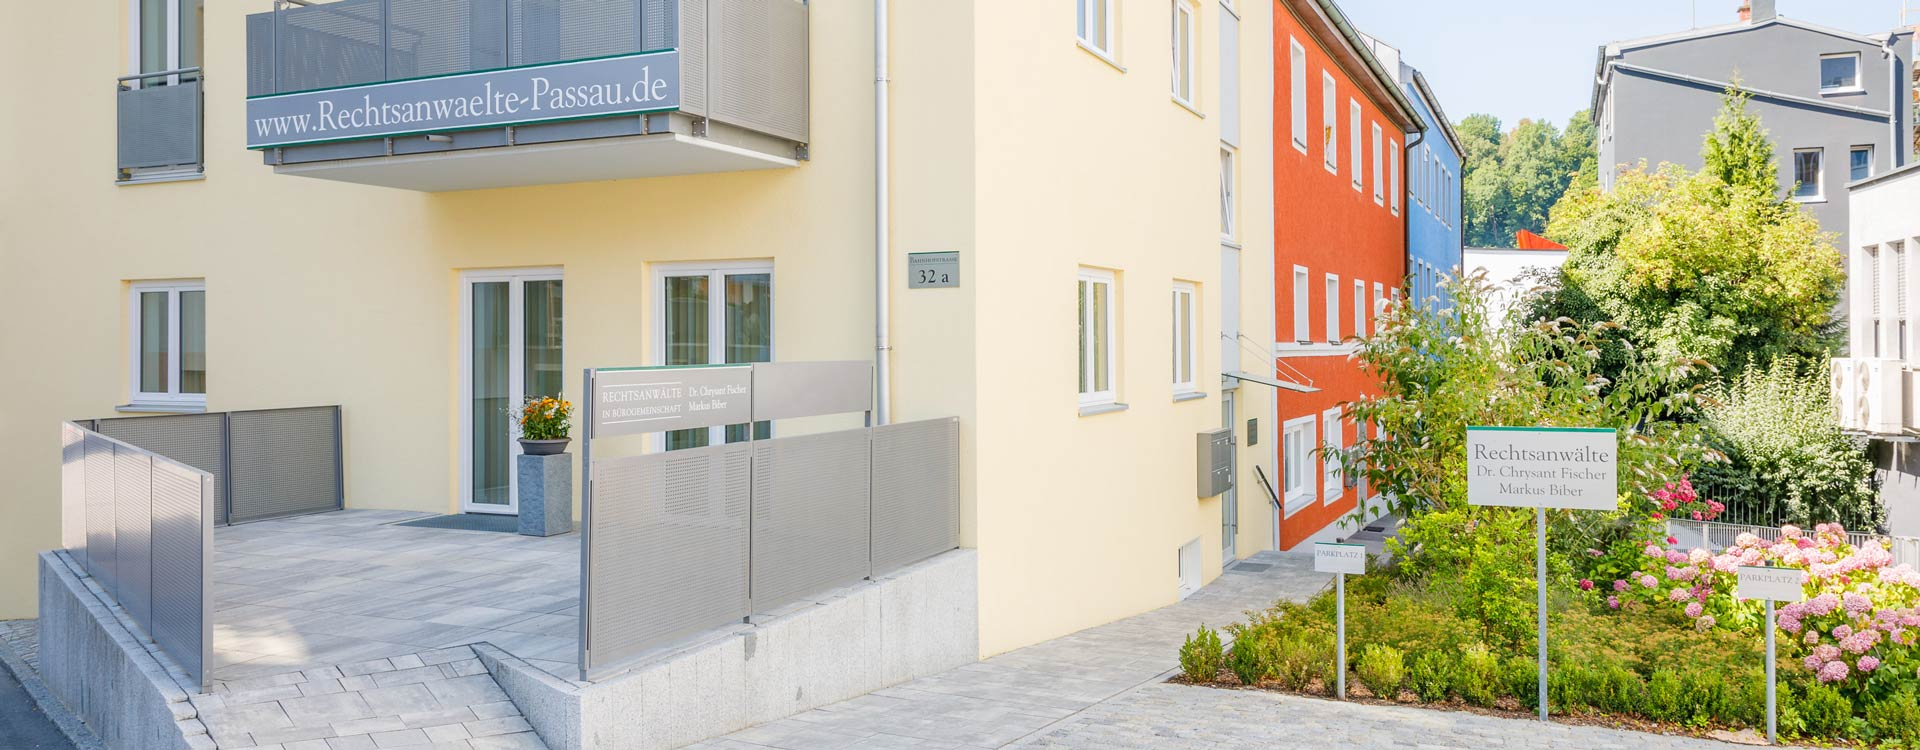 rechtsanwaltskanzlei in Passau